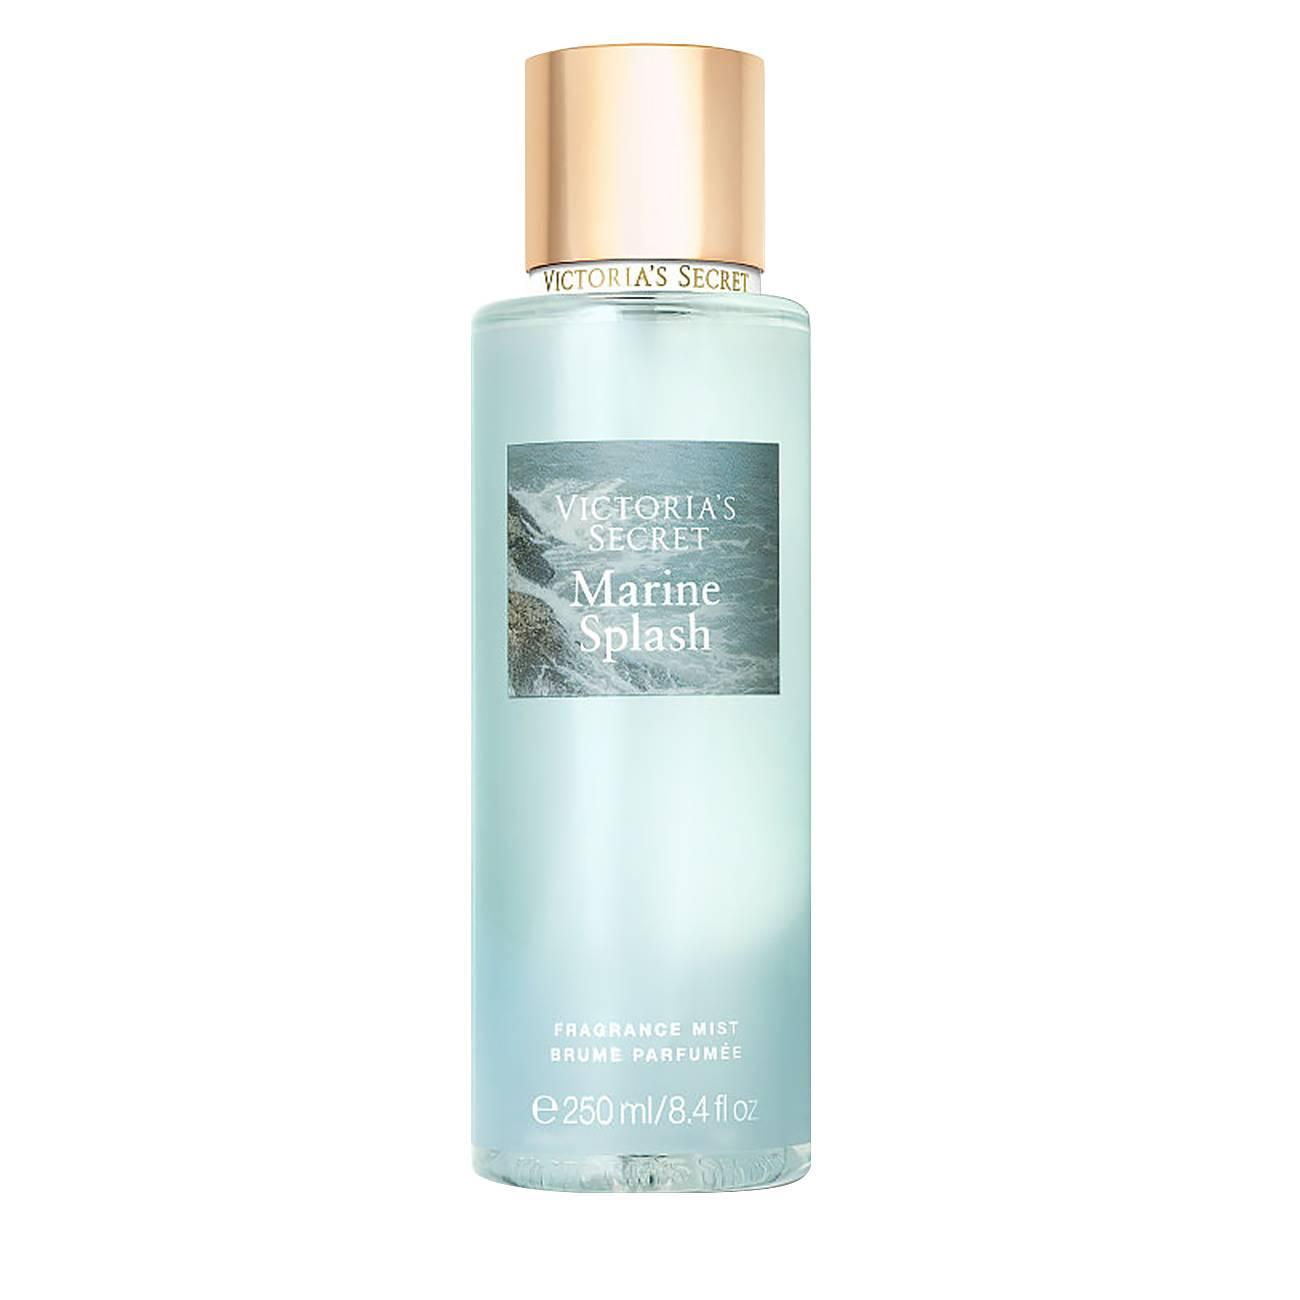 Marine Splash Mist Victoria's Secret imagine 2021 bestvalue.eu